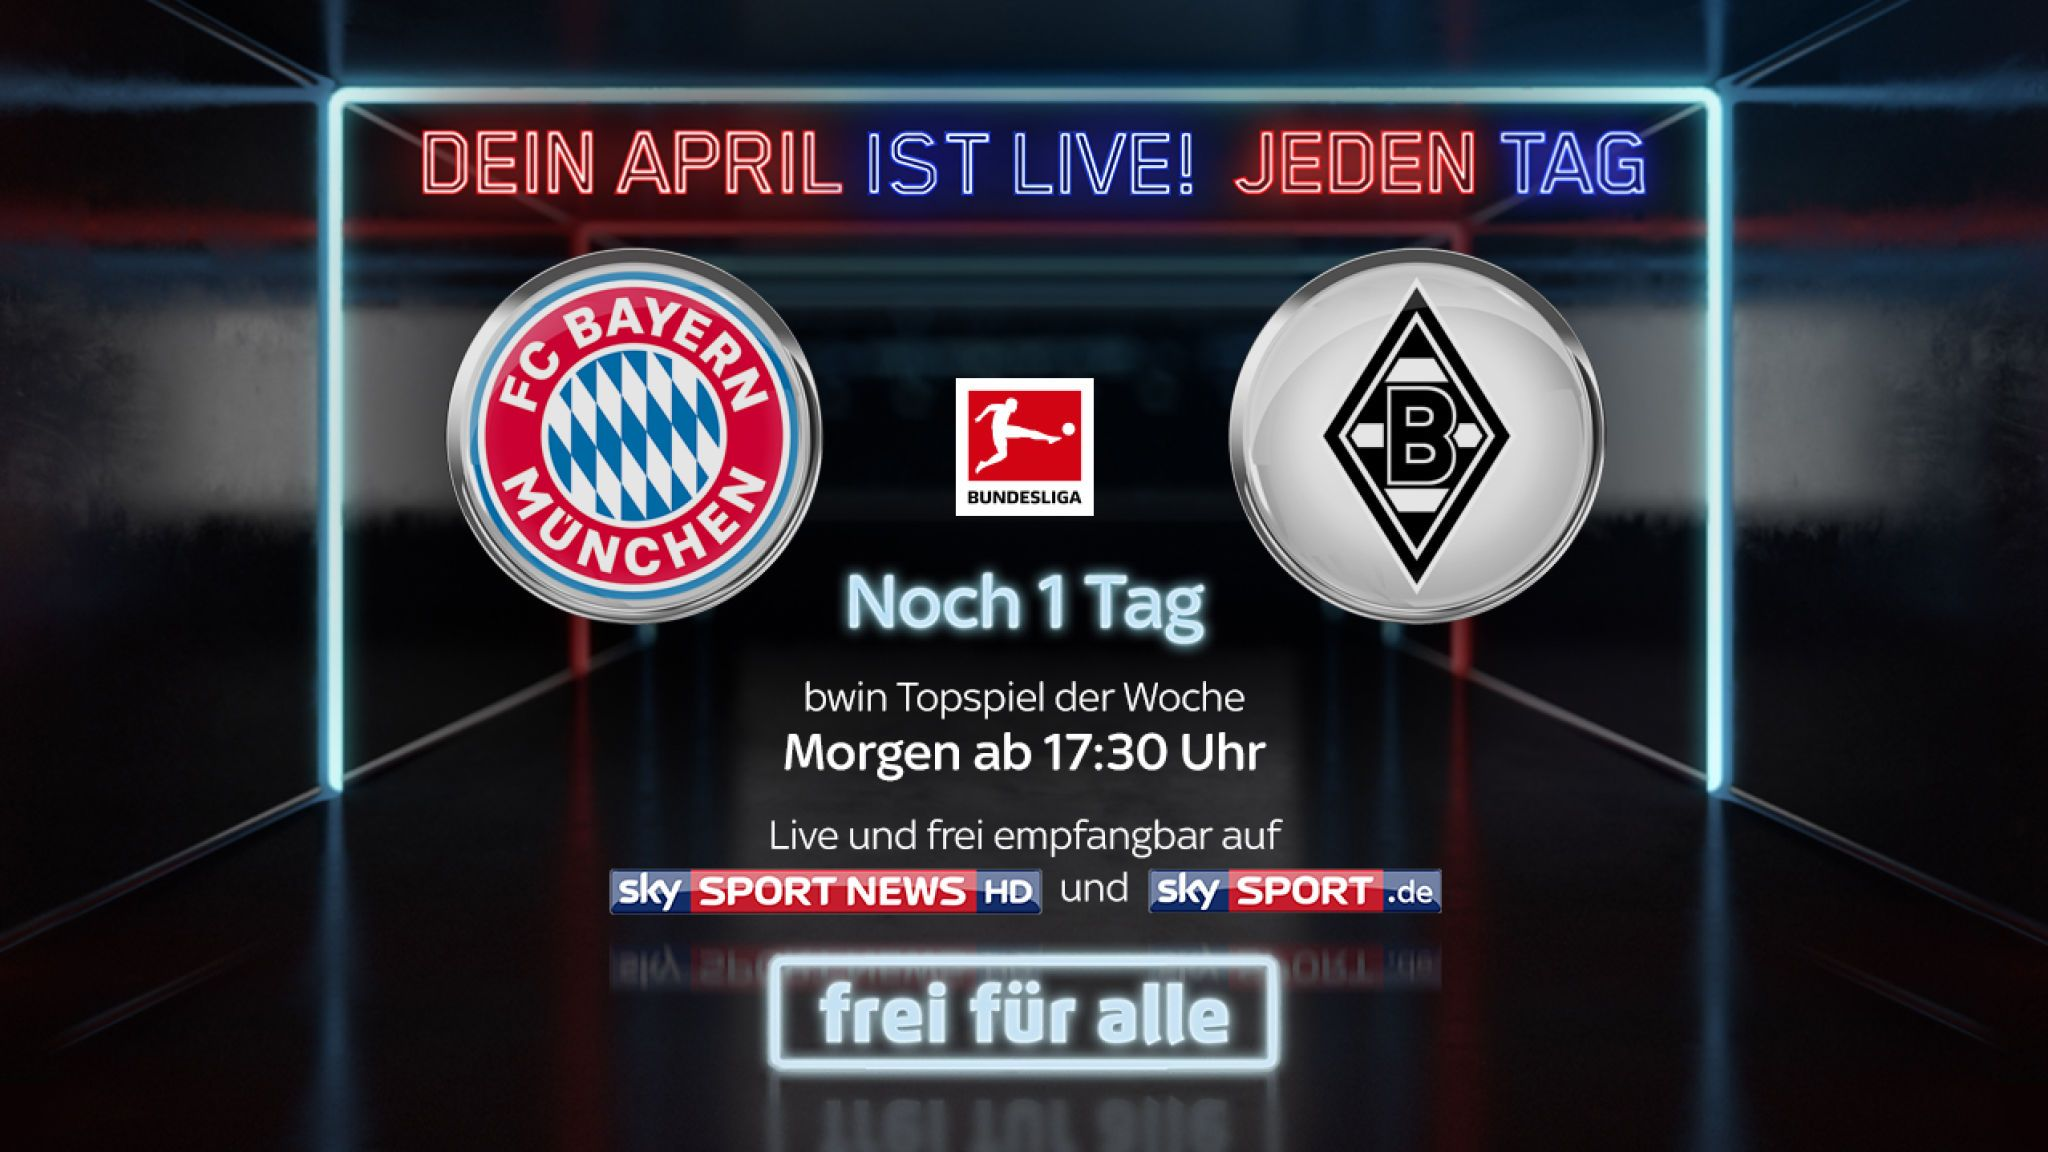 bayern gladbach free tv